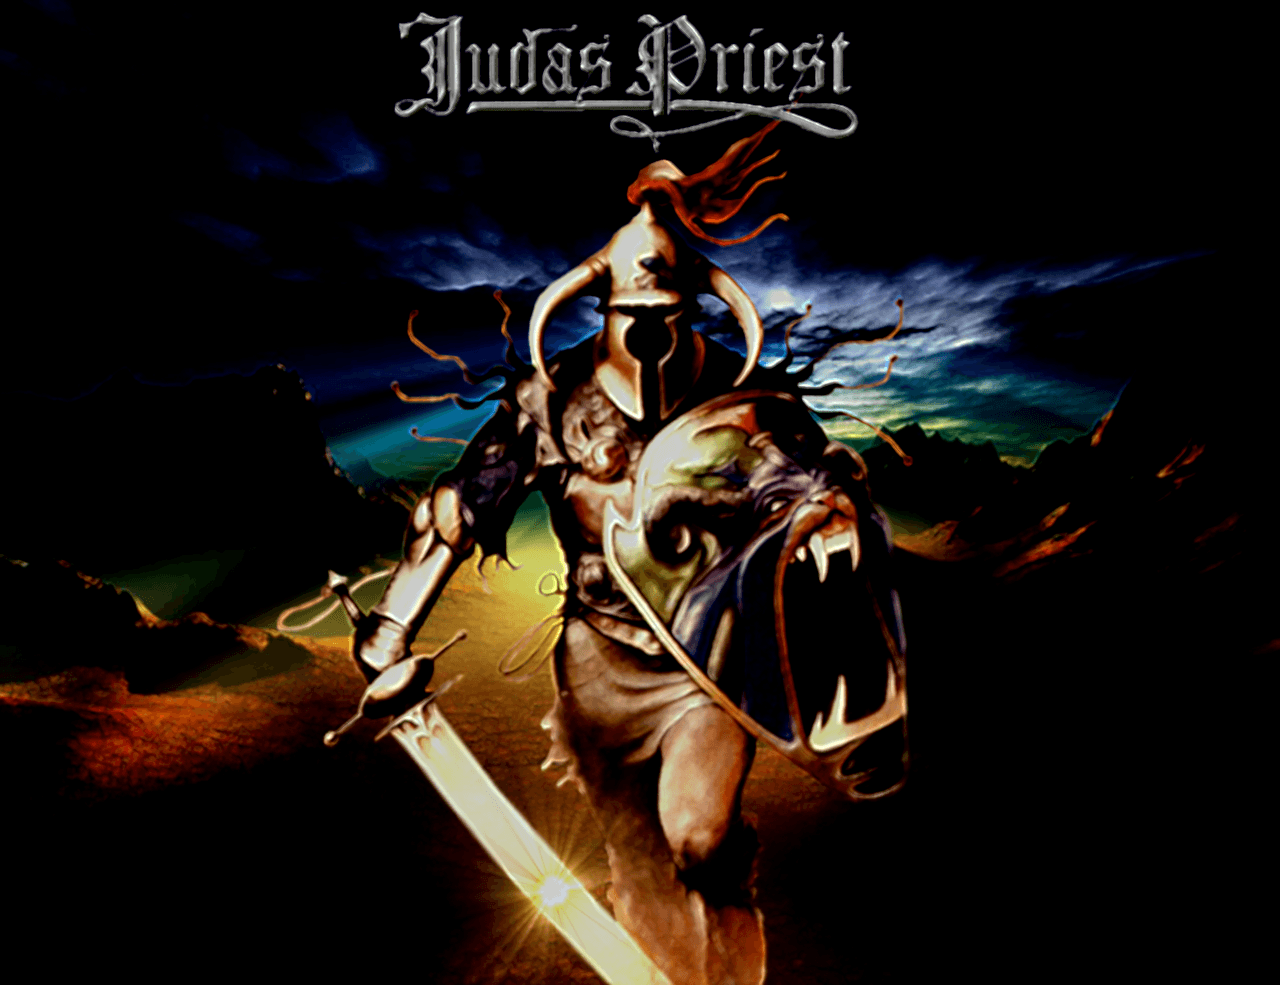 Megadeth Album Covers Judas Priest Wallpaper...